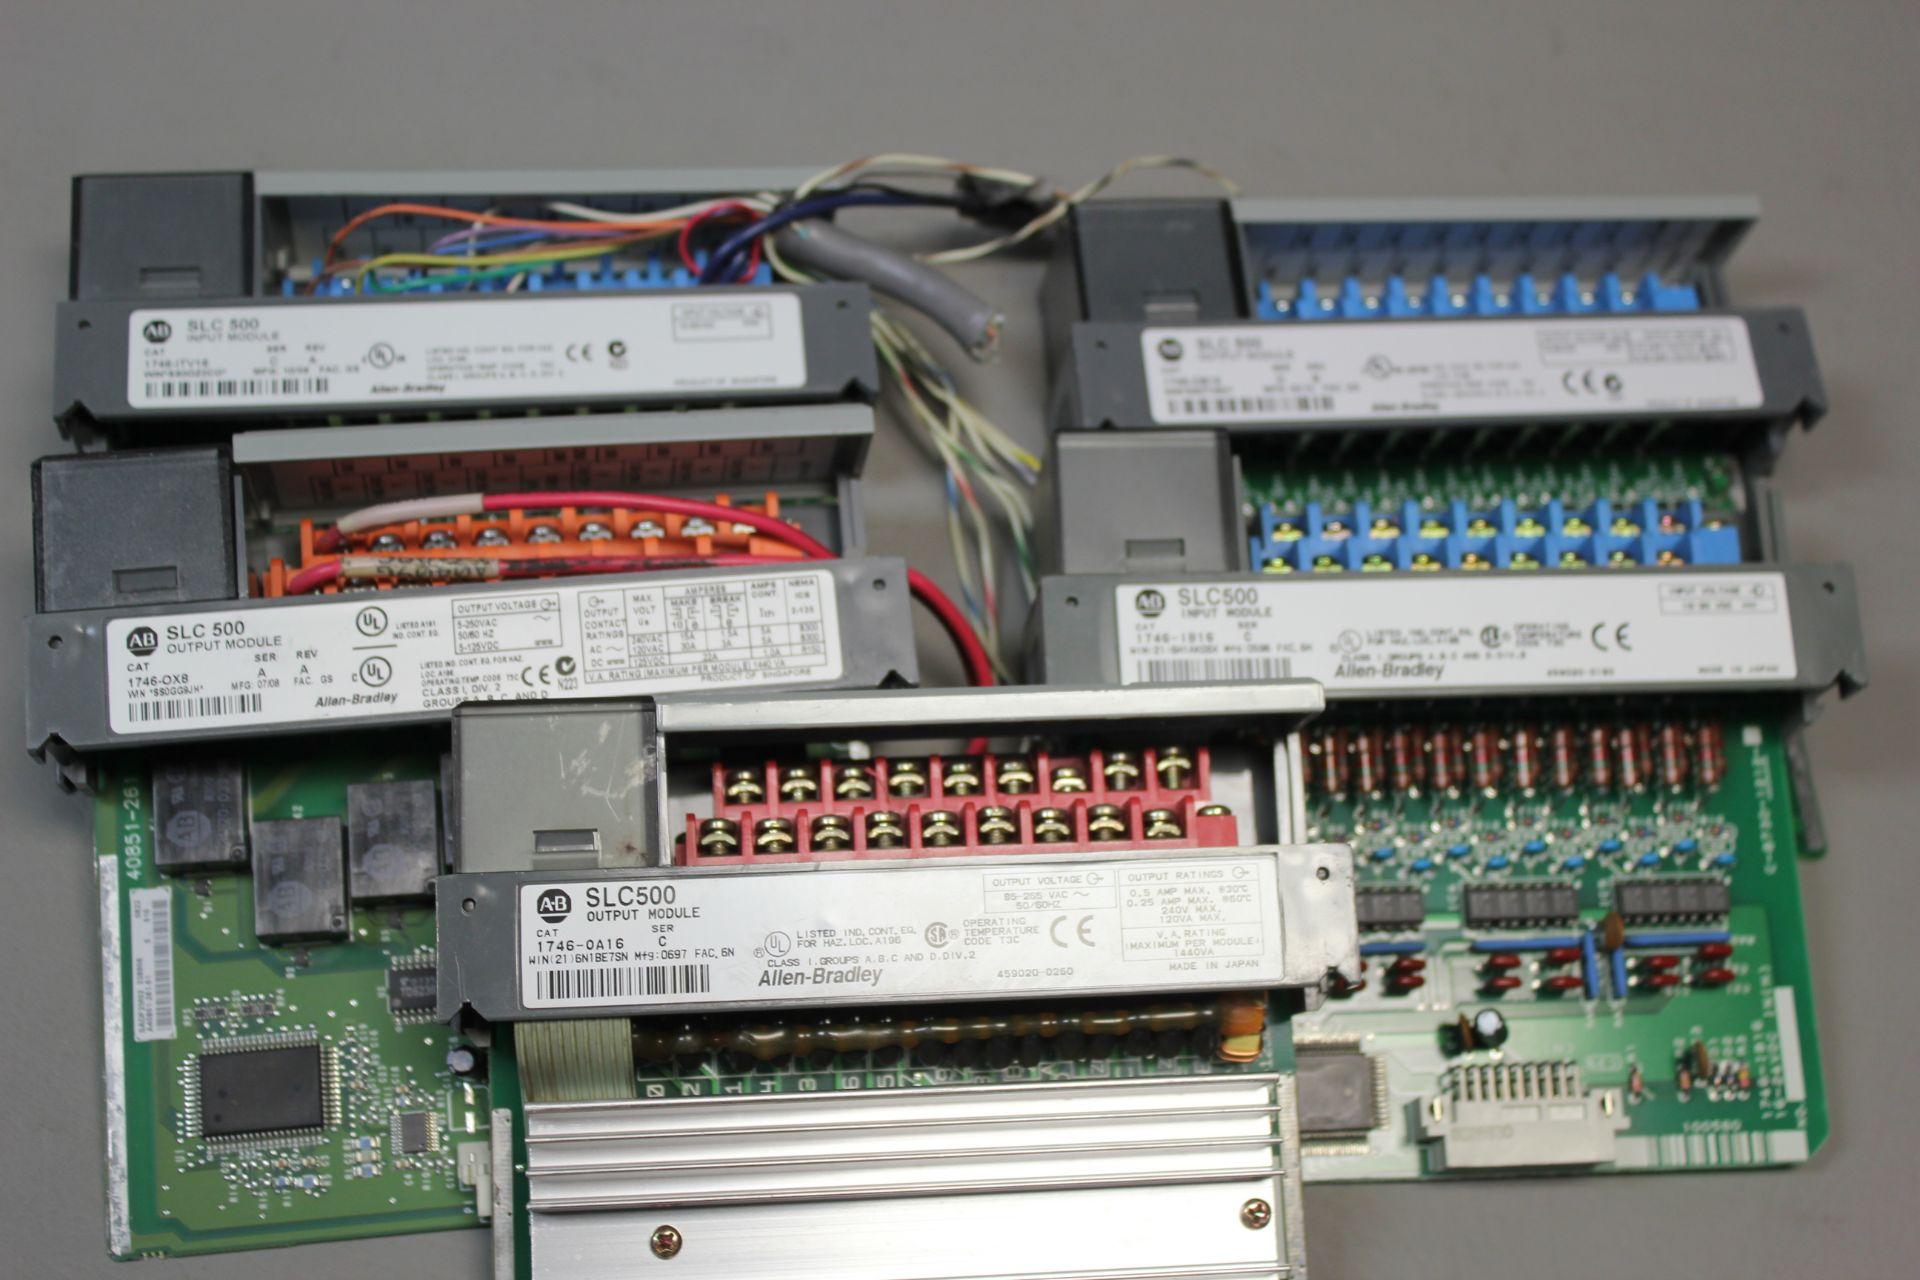 LOT OF ALLEN BRADLEY PLC MODULES - Image 2 of 2